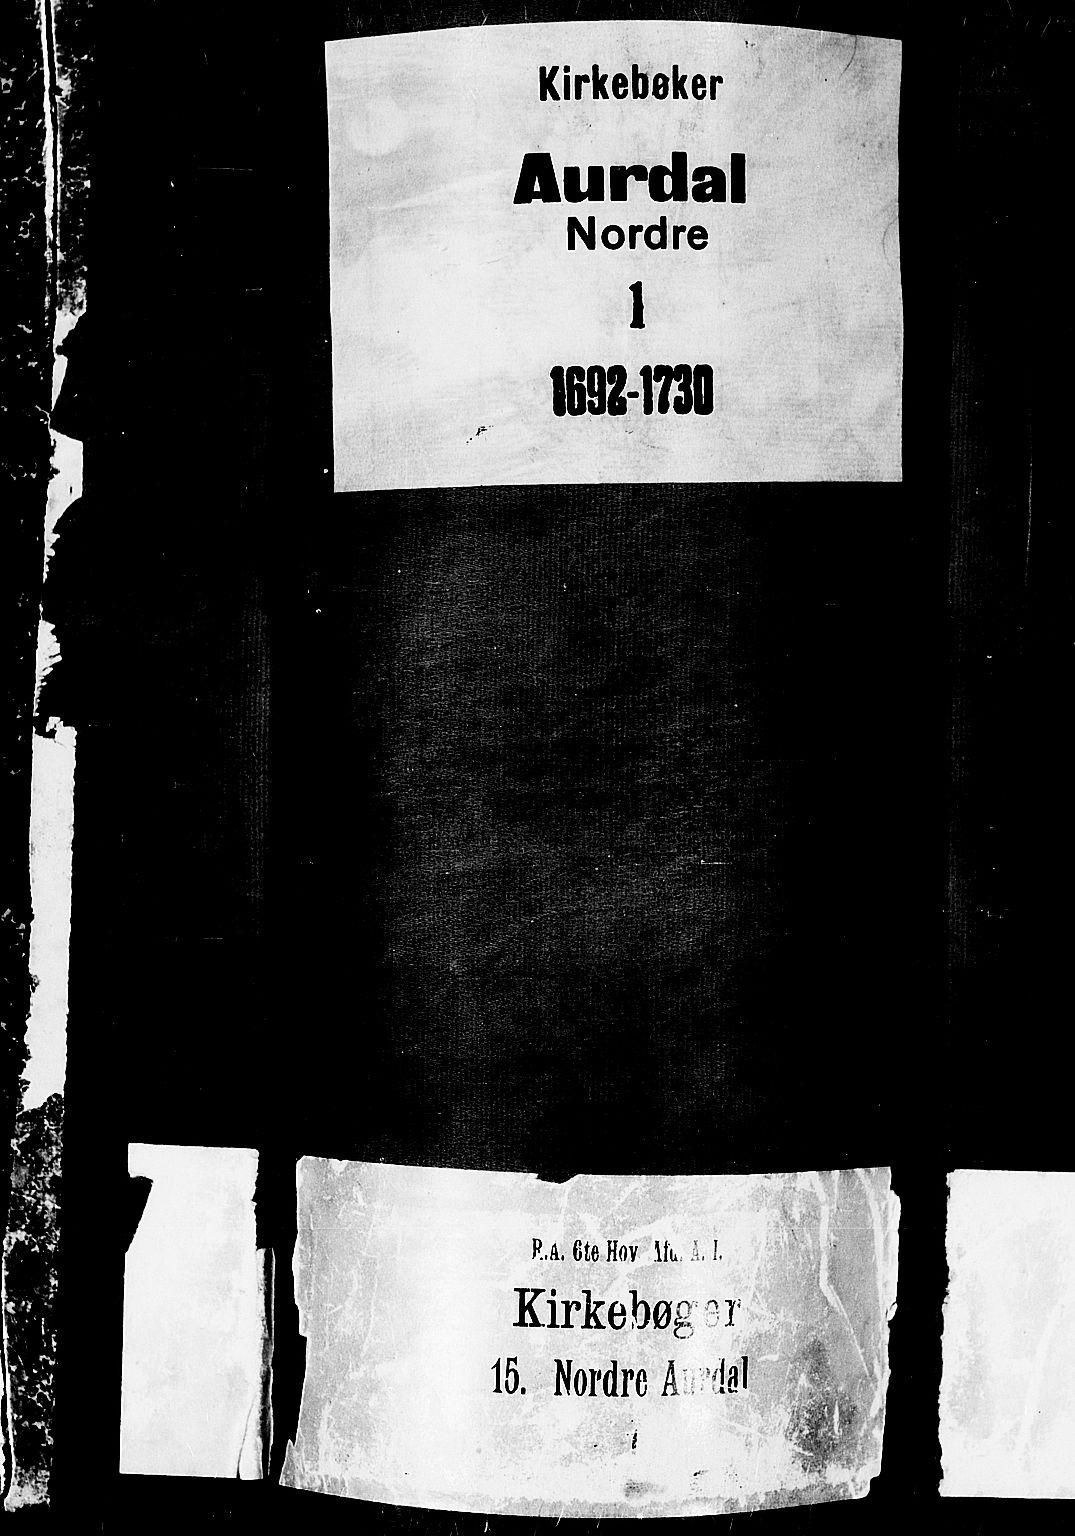 SAH, Aurdal prestekontor, Ministerialbok nr. 1-3, 1692-1730